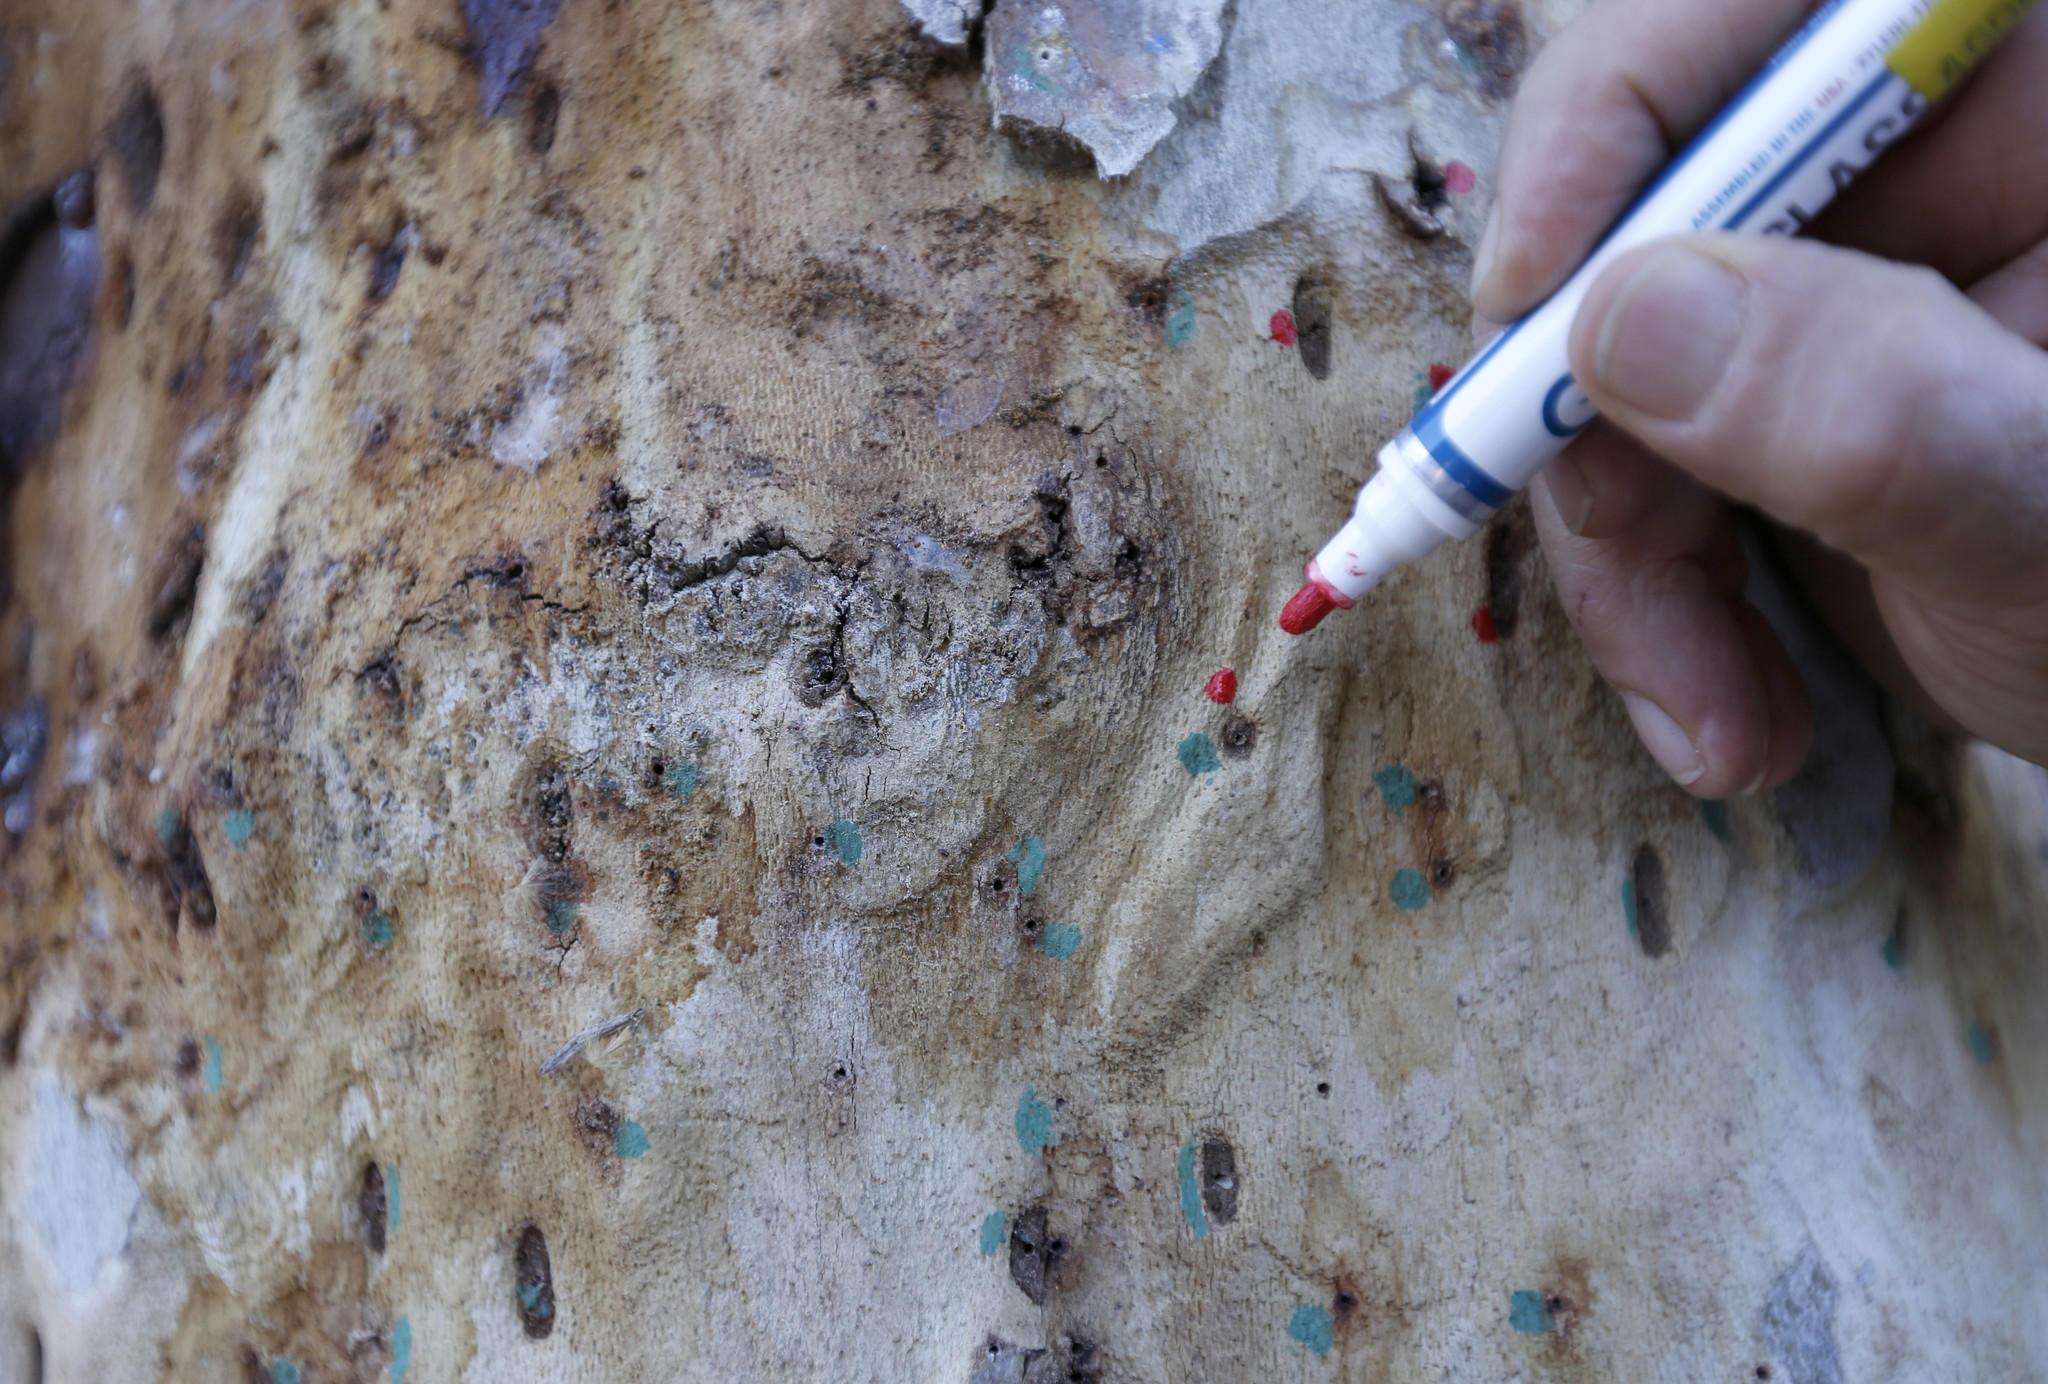 Akif Eskalen marks the beetles' entry points.